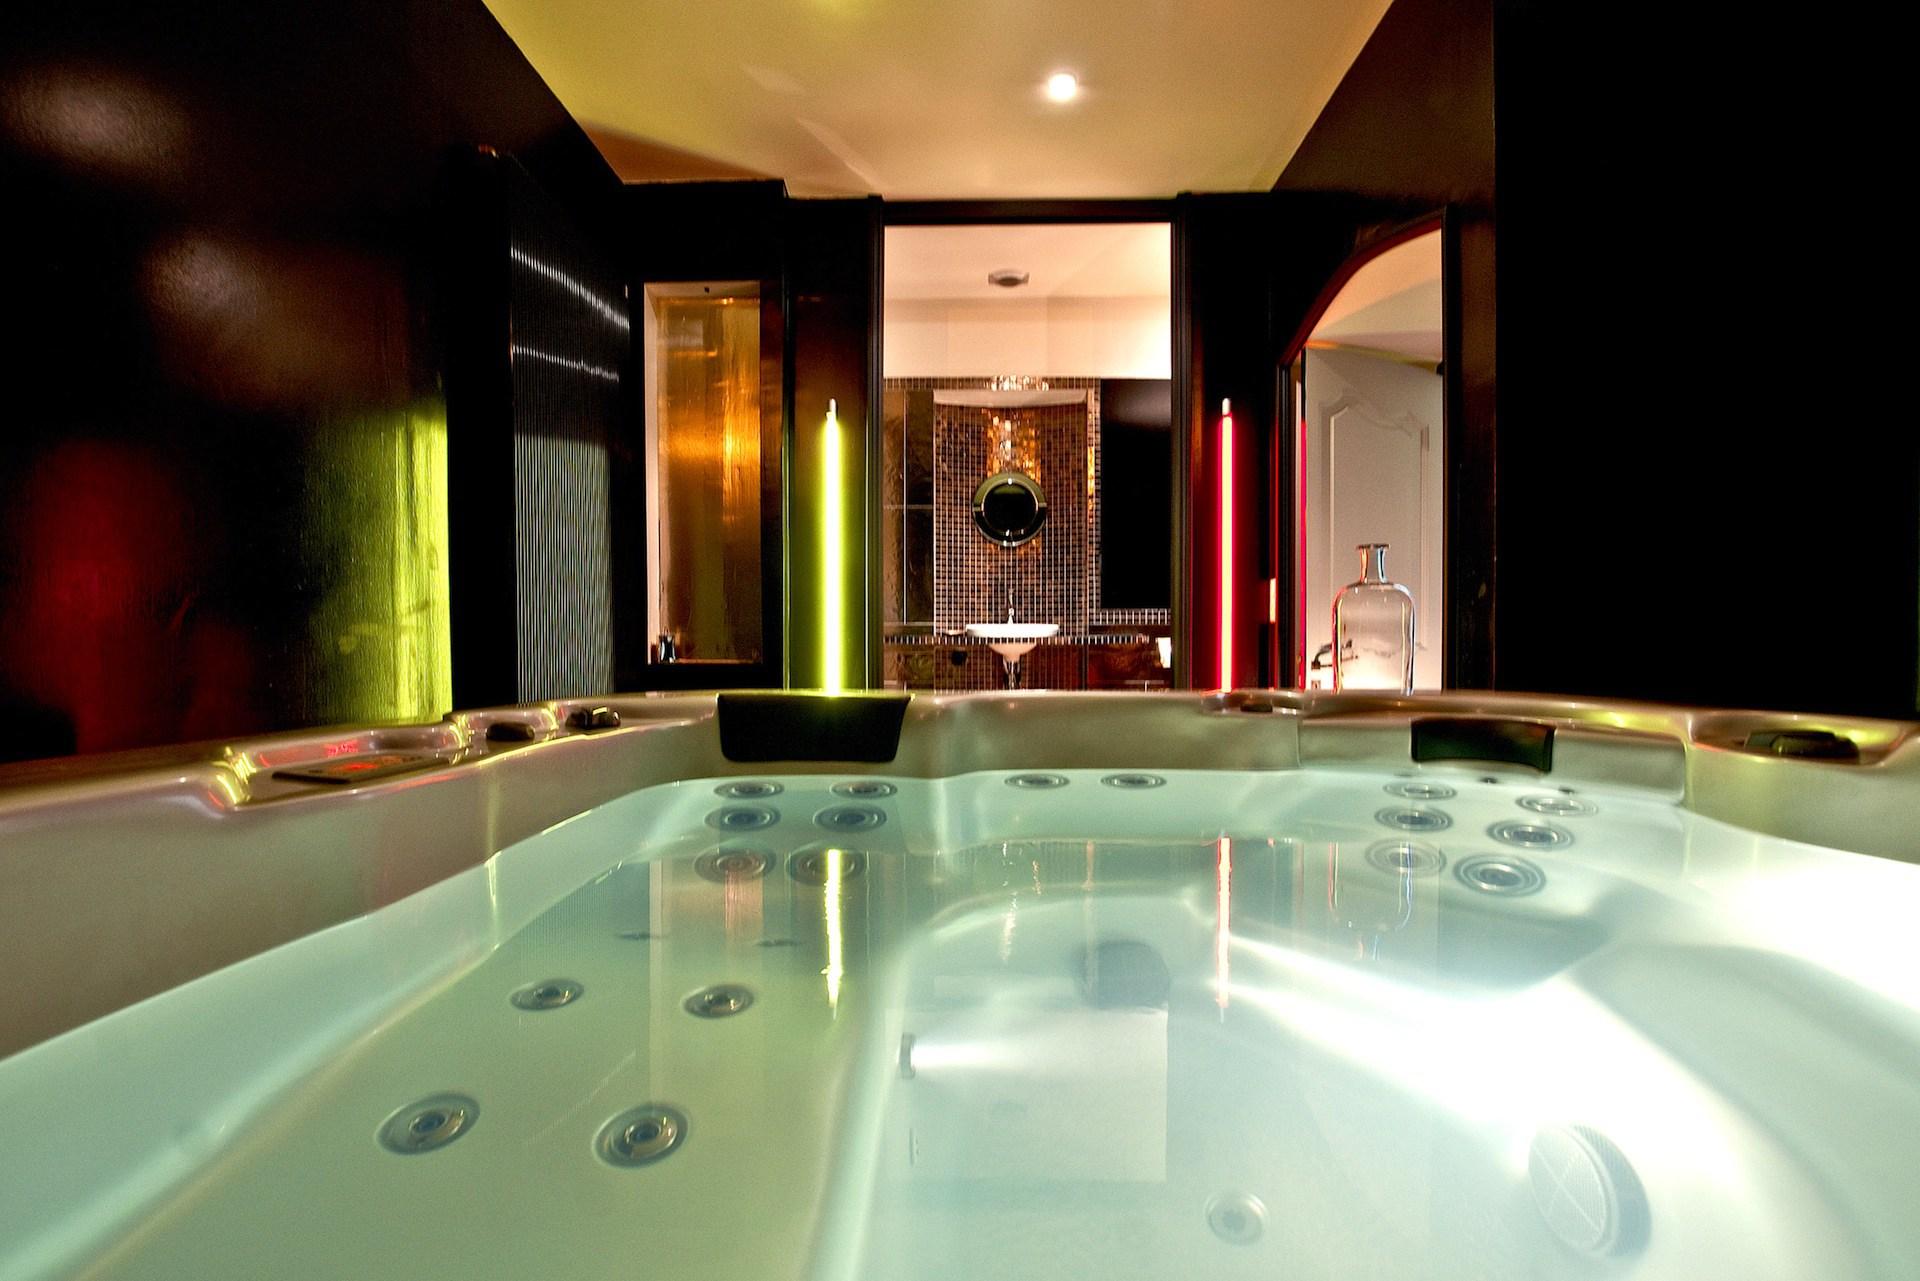 Villa Nassalia Hotel - room photo 11335420